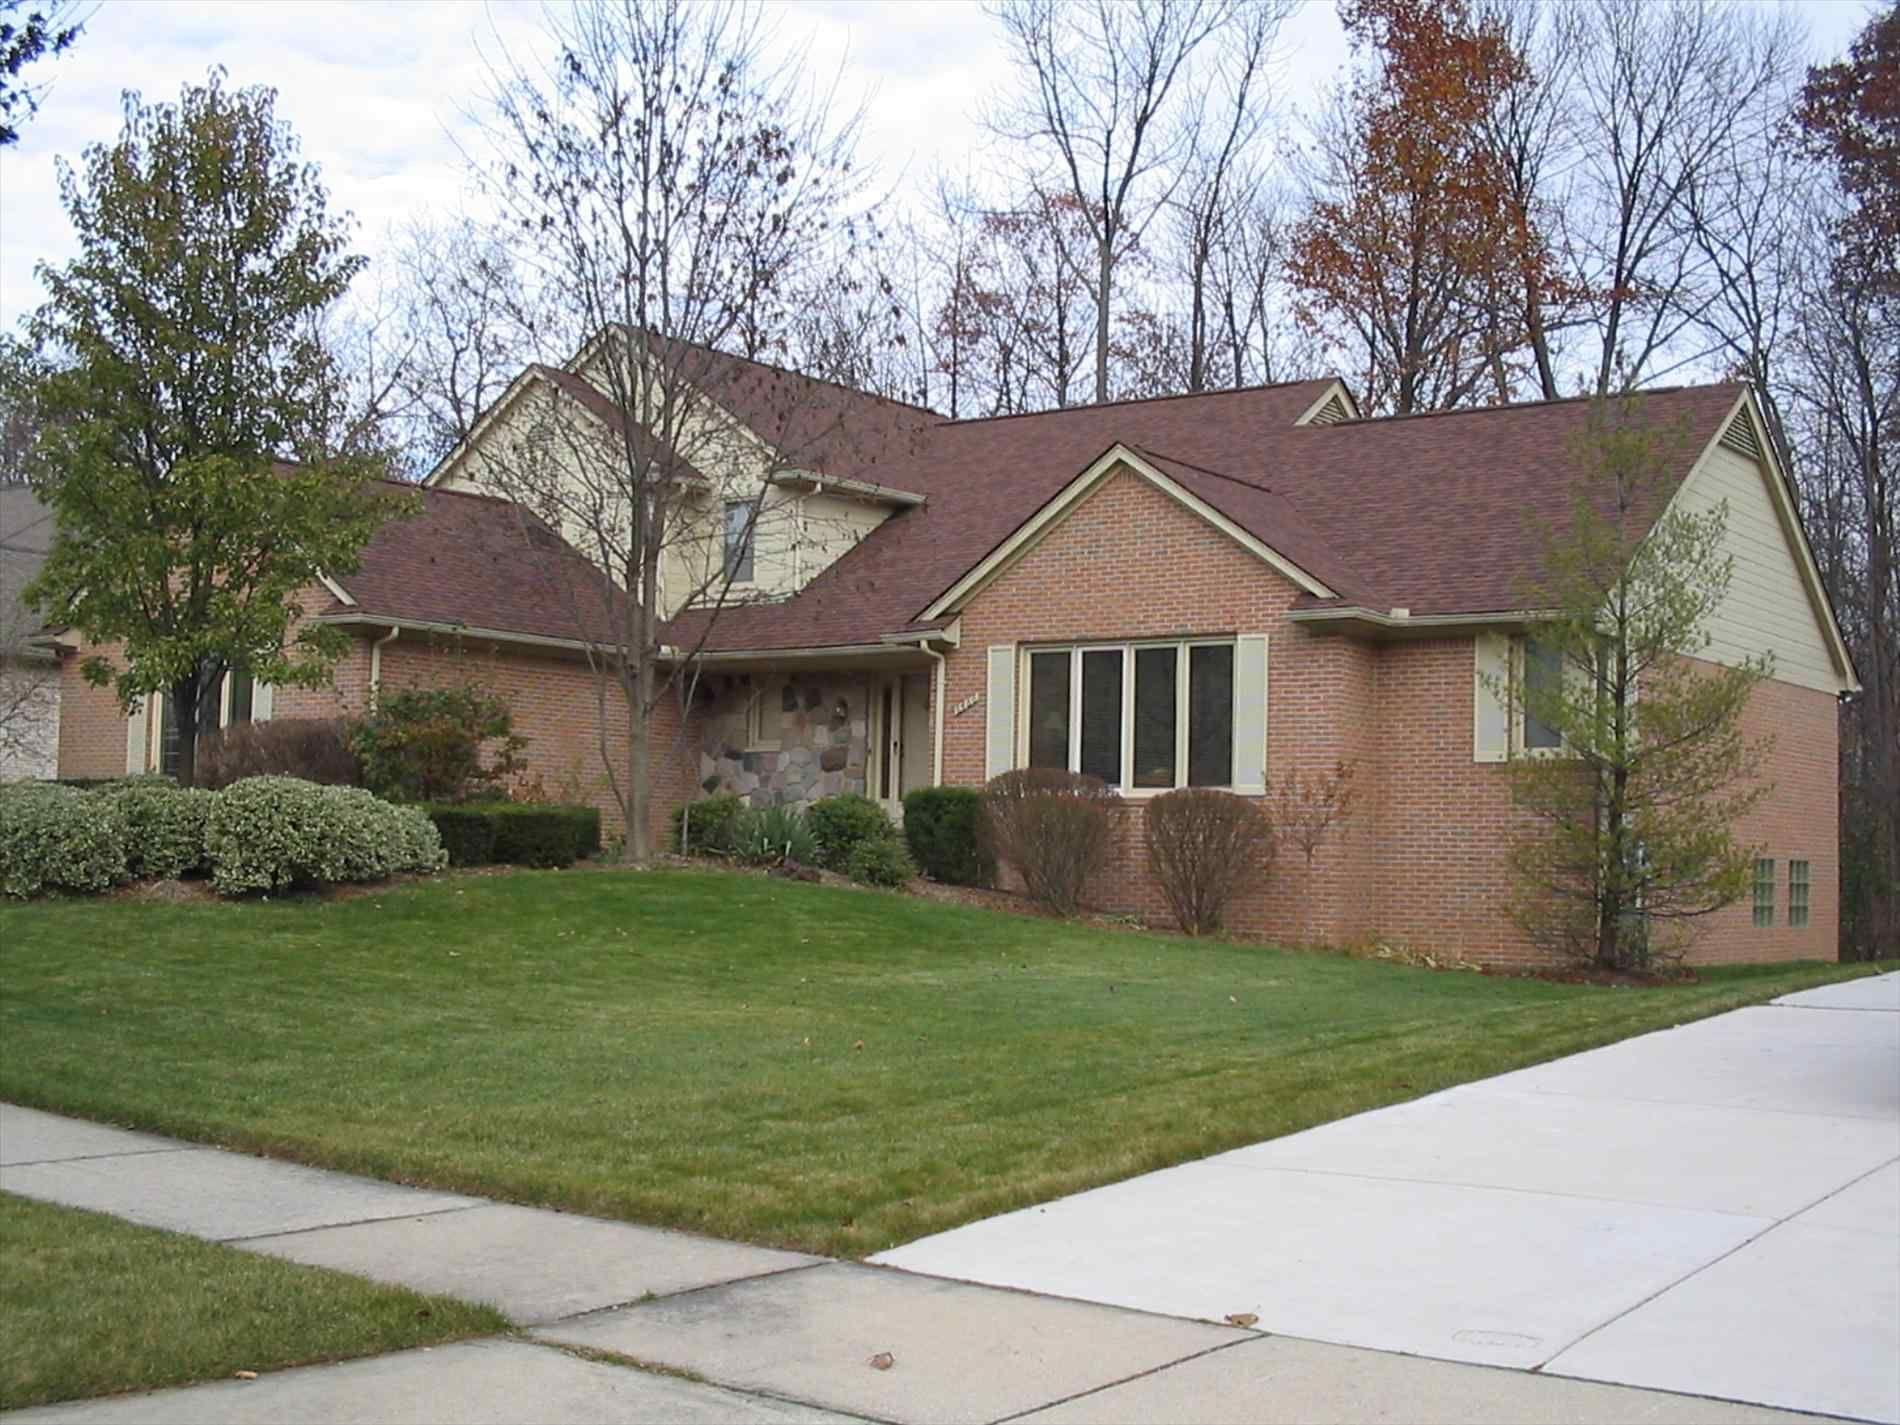 Certainteed Landmark Roof Shingles Home Roof Ideas Architectural Shingles Shingle Colors Roof Shingles